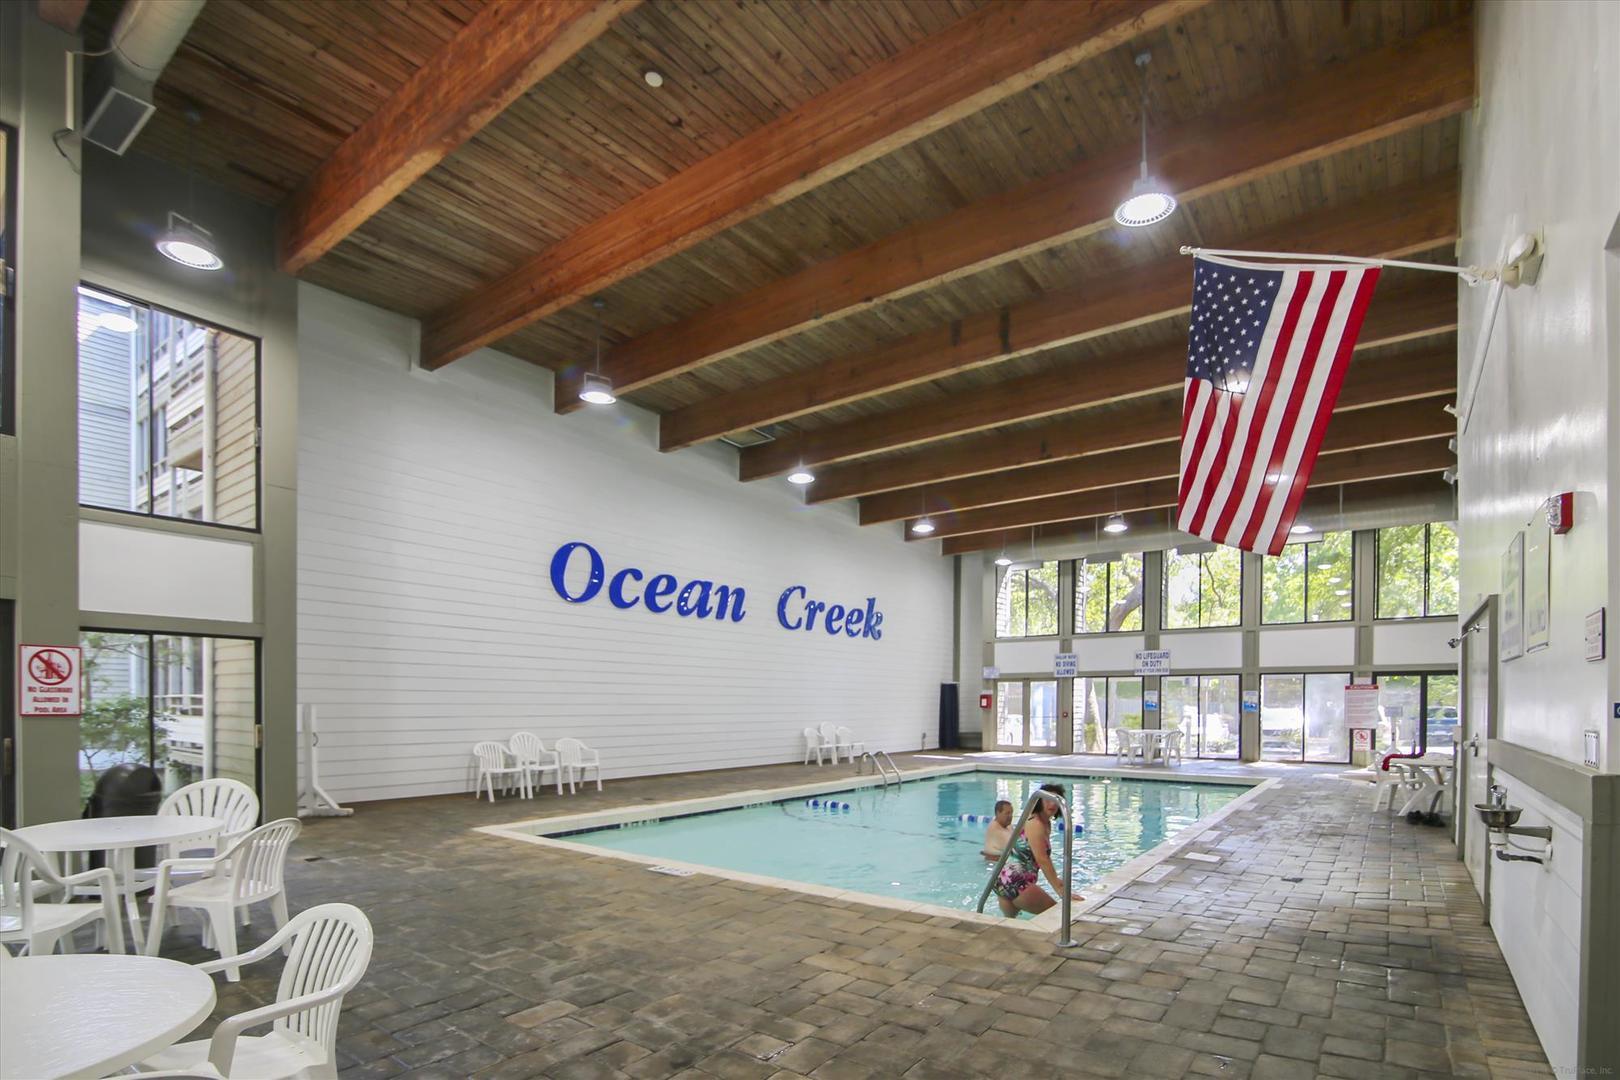 Ocean Creek - Indoor Lodge Pool